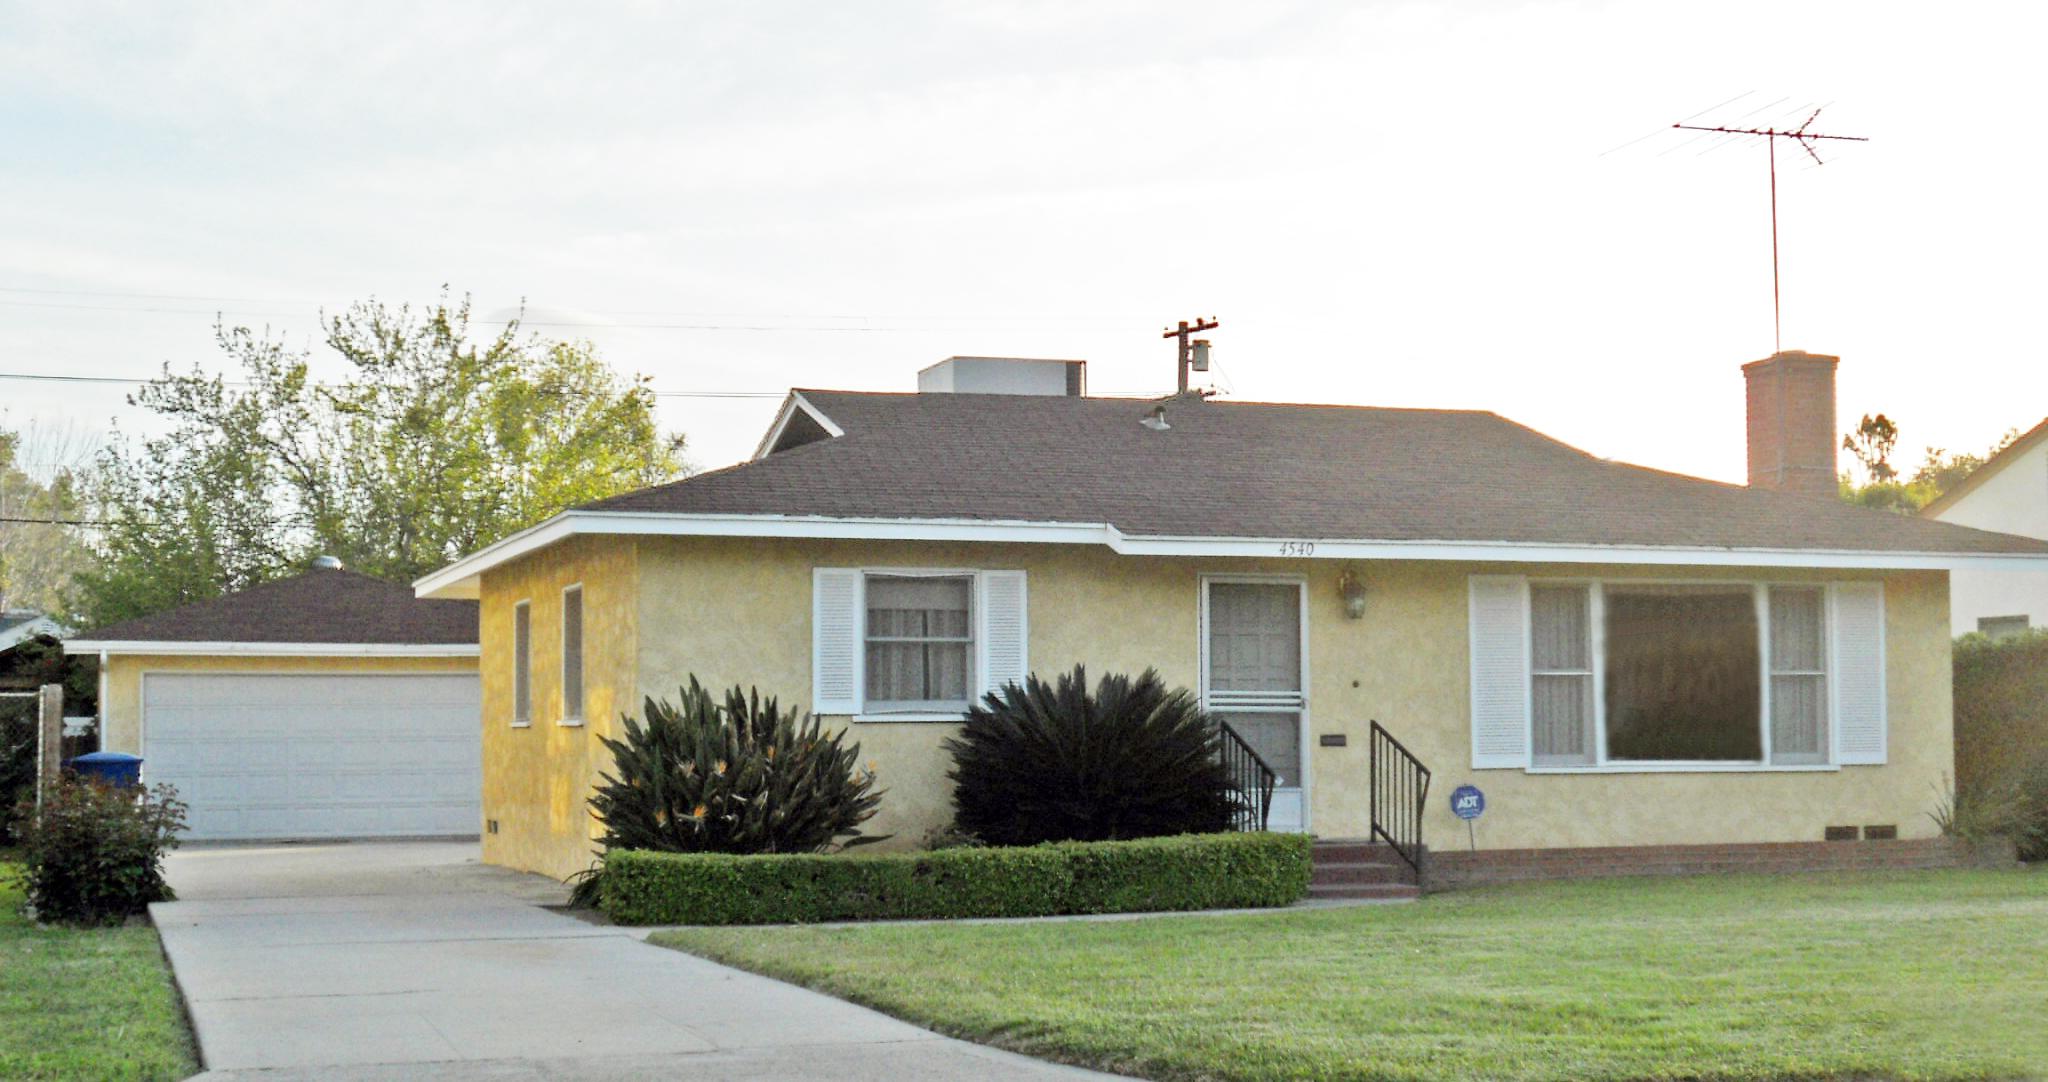 4540 Linwood Place, Riverside CA 92506